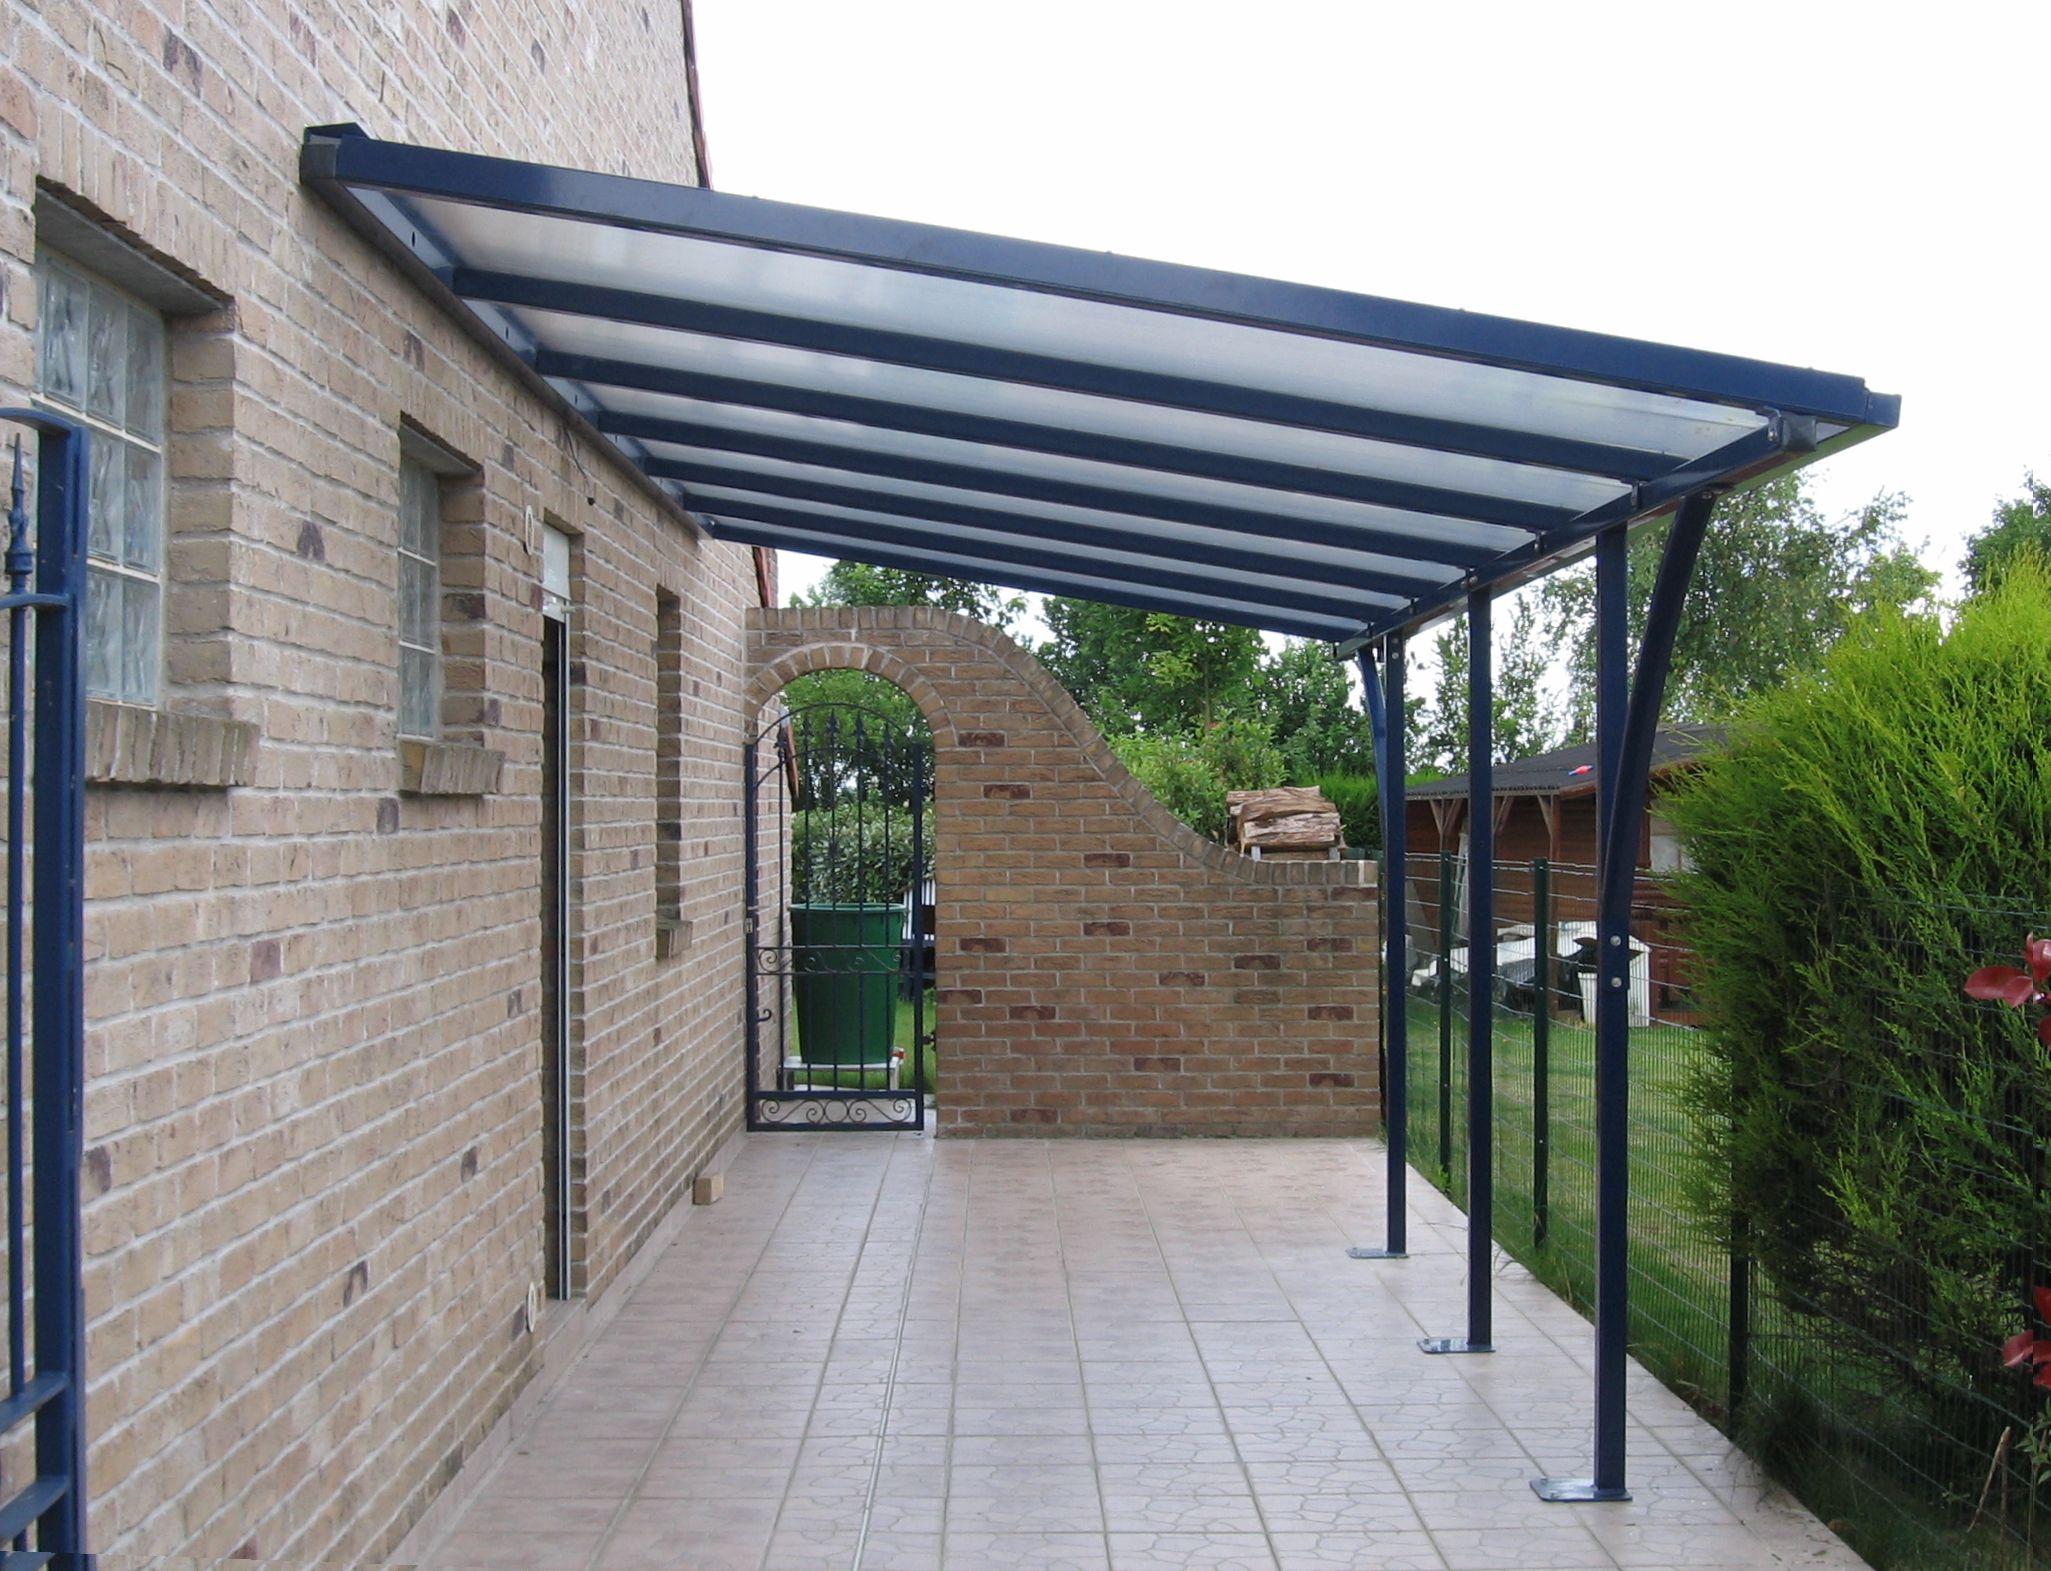 Abri Metal De Terrasse Www Nea Concept Com T 0241644476 Pergola Bioclimatique Pergola Pergola Moderne